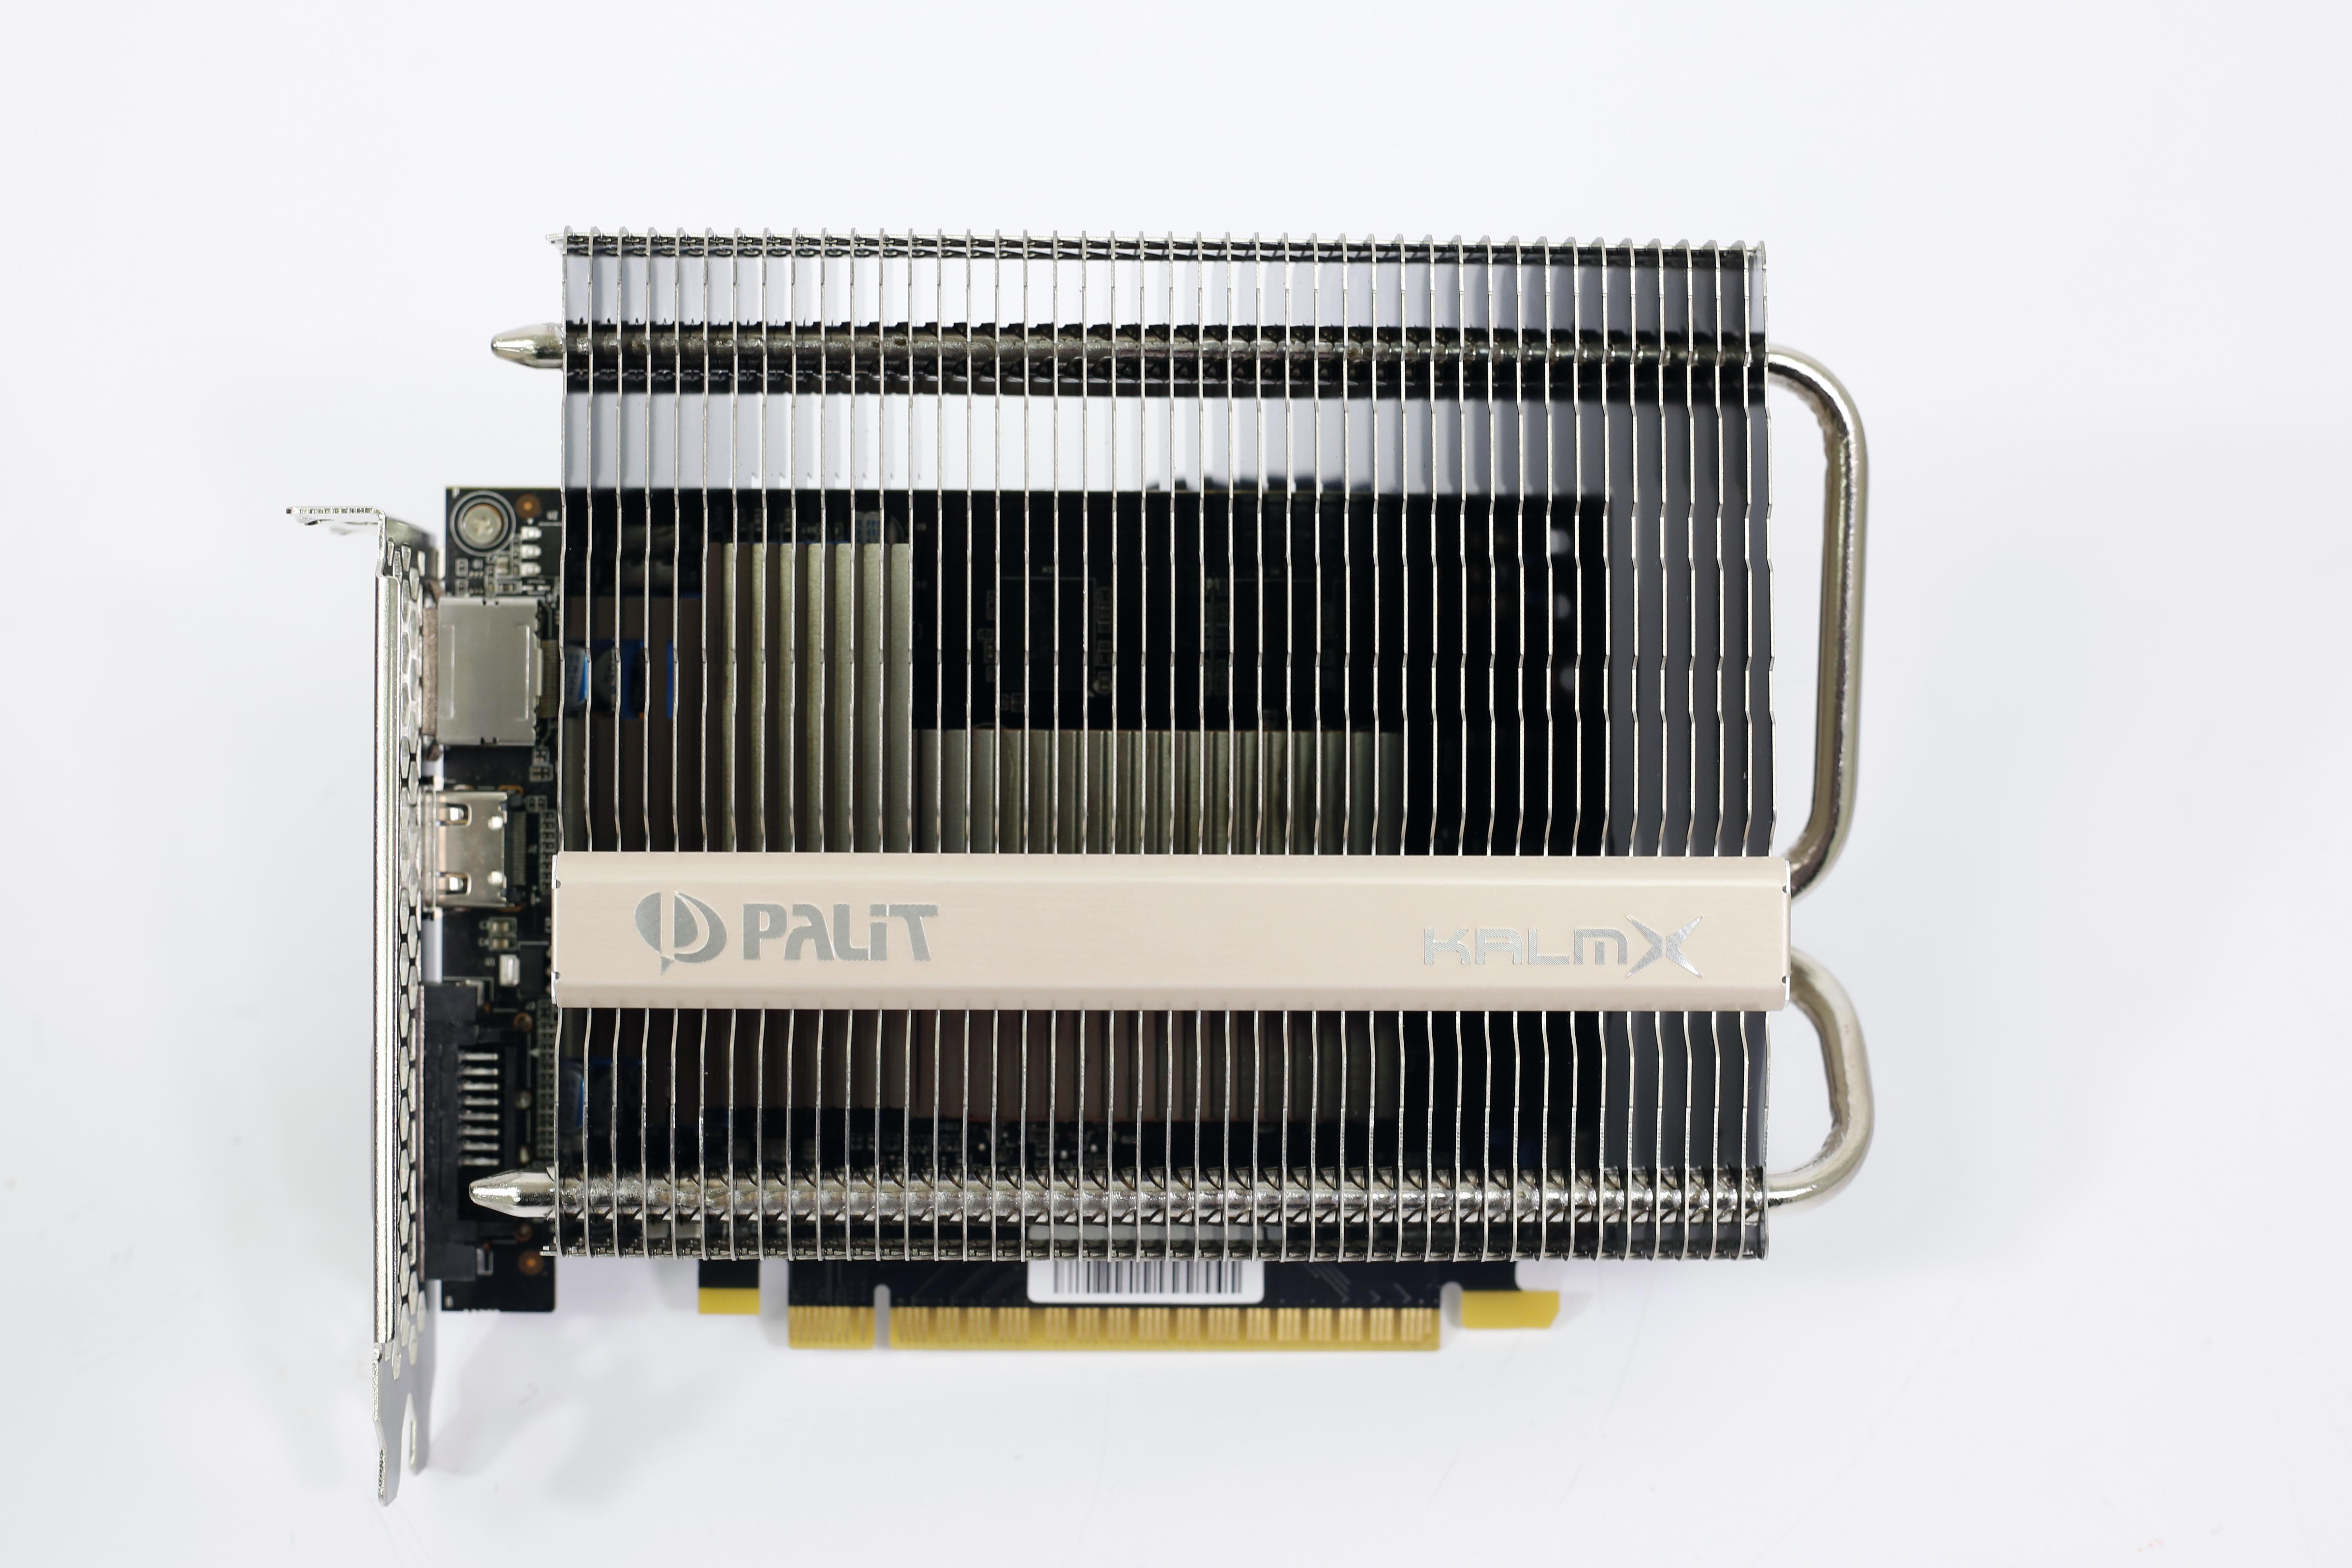 Palit GTX 1050 Ti KalmX